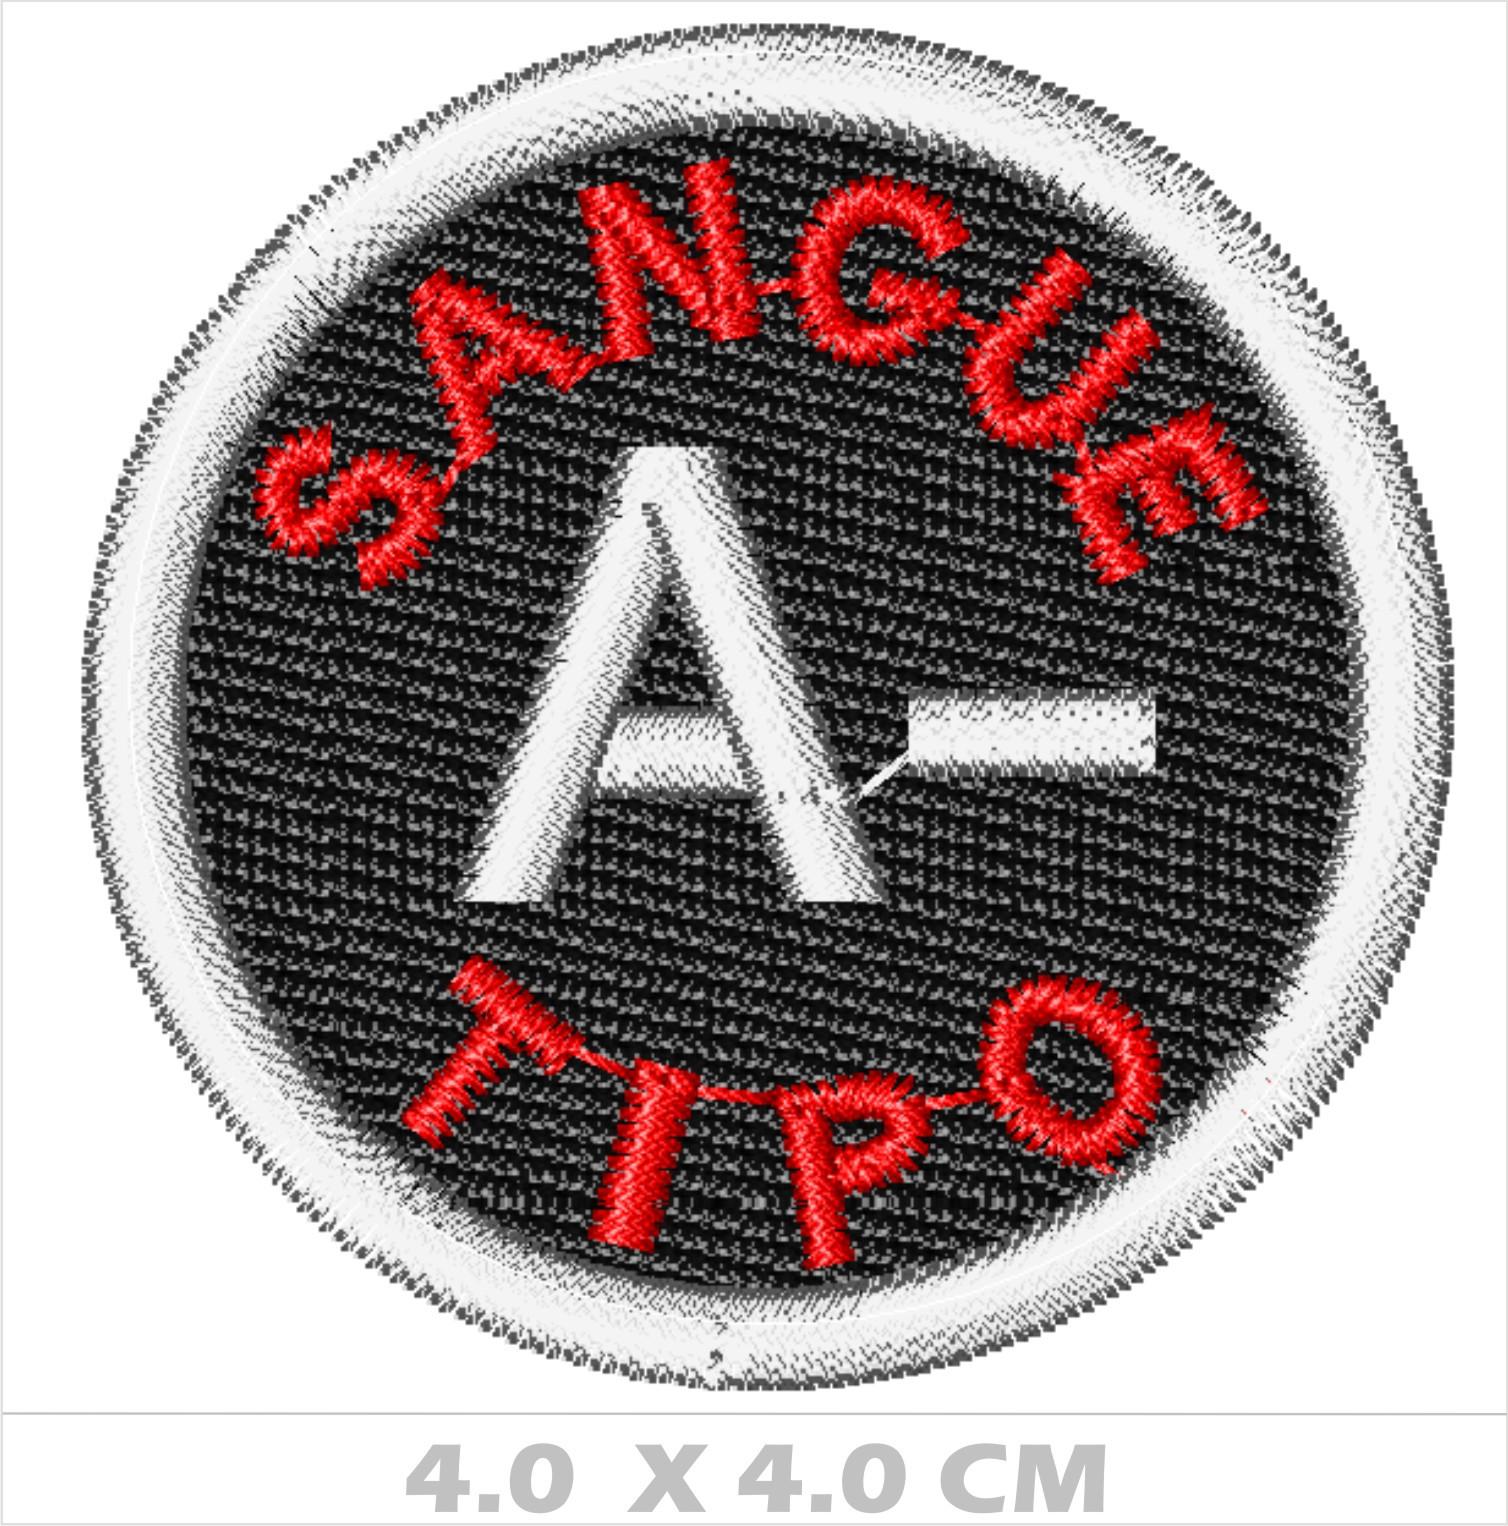 WA01-00002 - BORDADO  TIPO SANGUE REDONDO A-